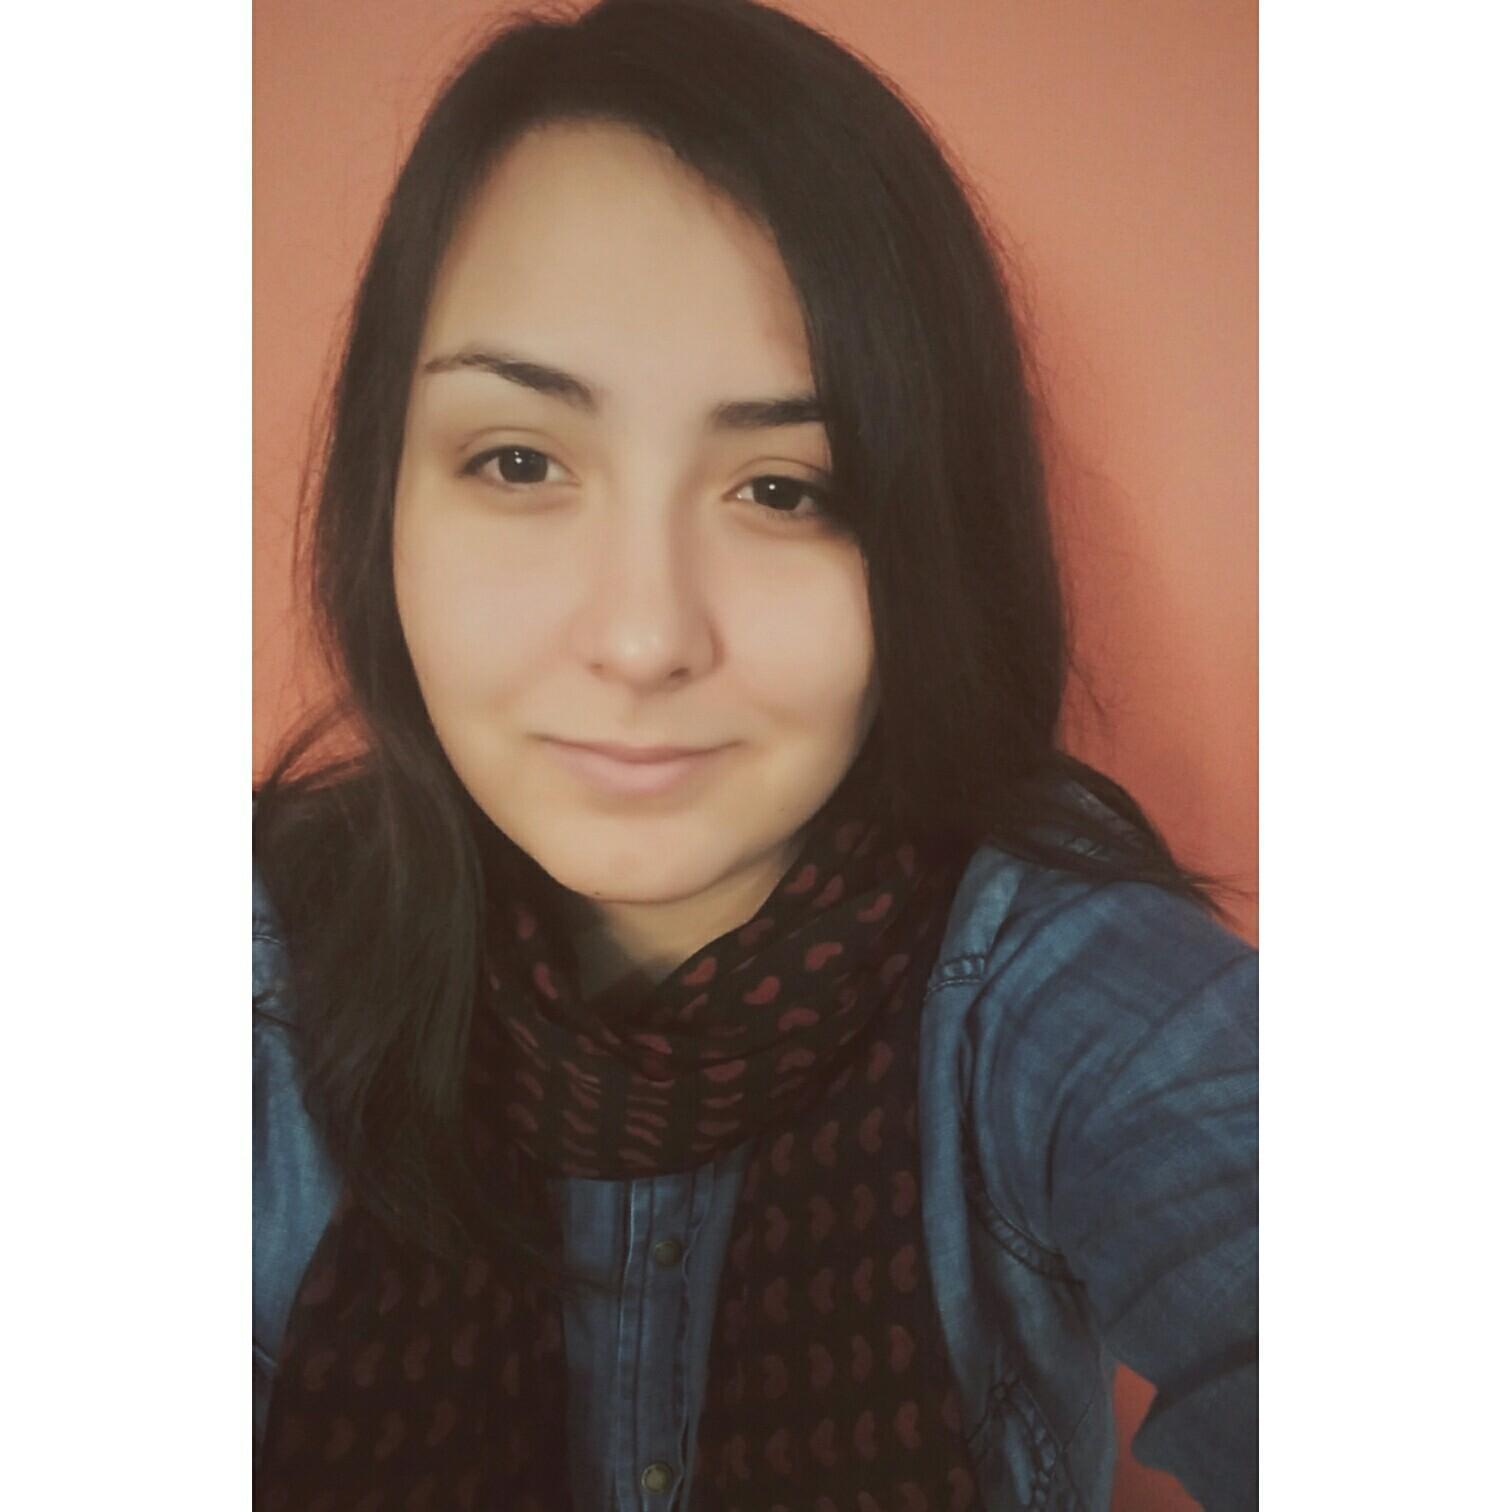 Mariana Rezer